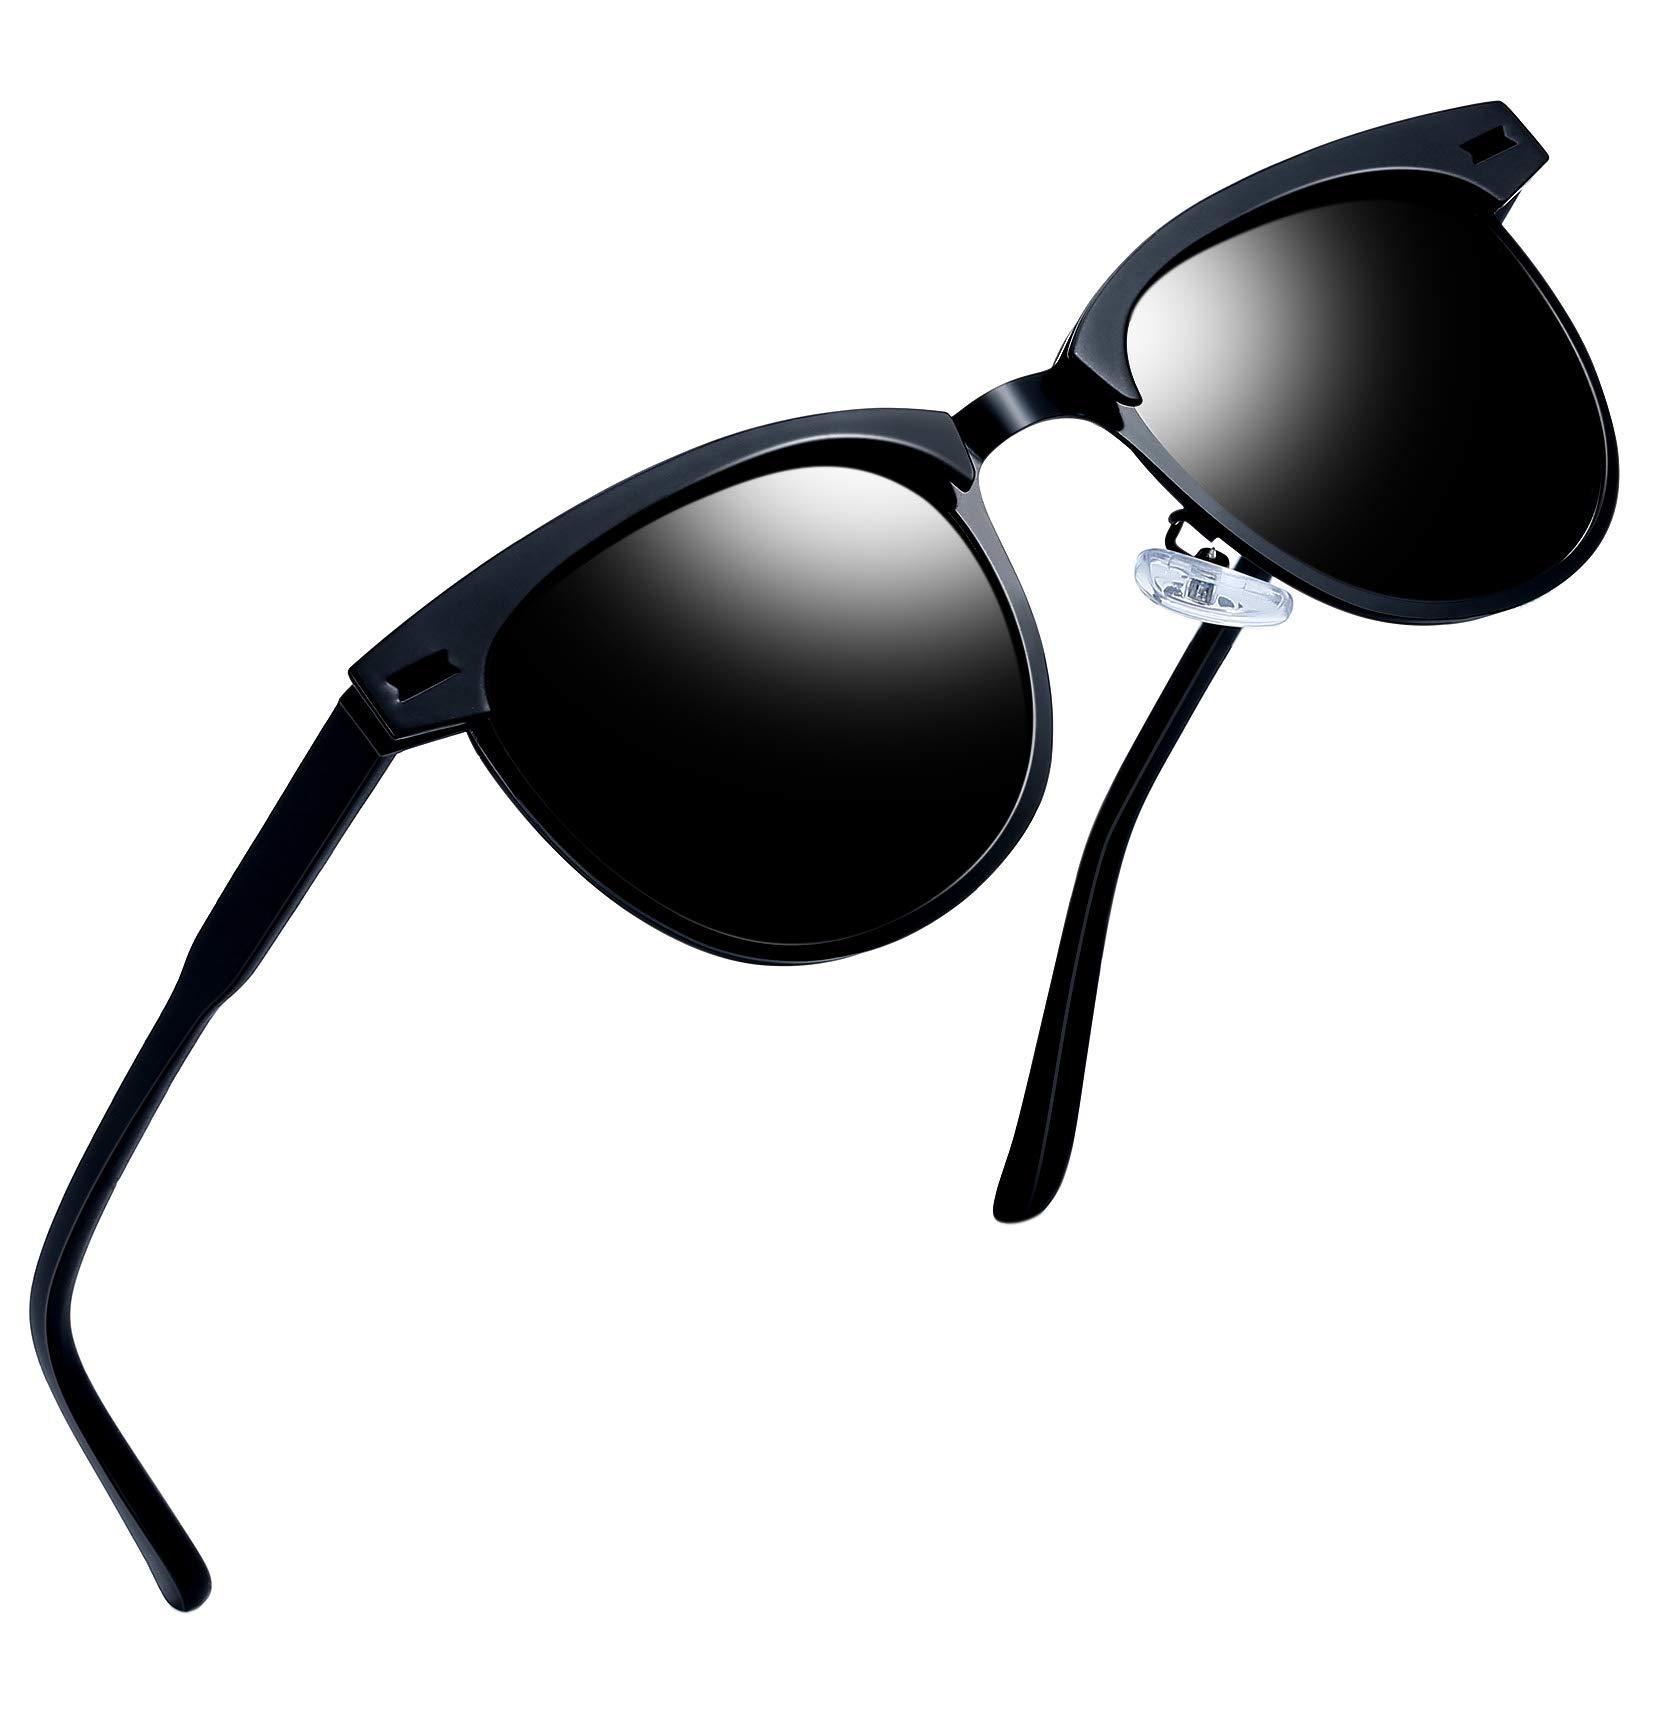 Joopin Semi Rimless Polarized Sunglasses Women Men Retro Brand Sun Glasses (Black Metal) by Joopin